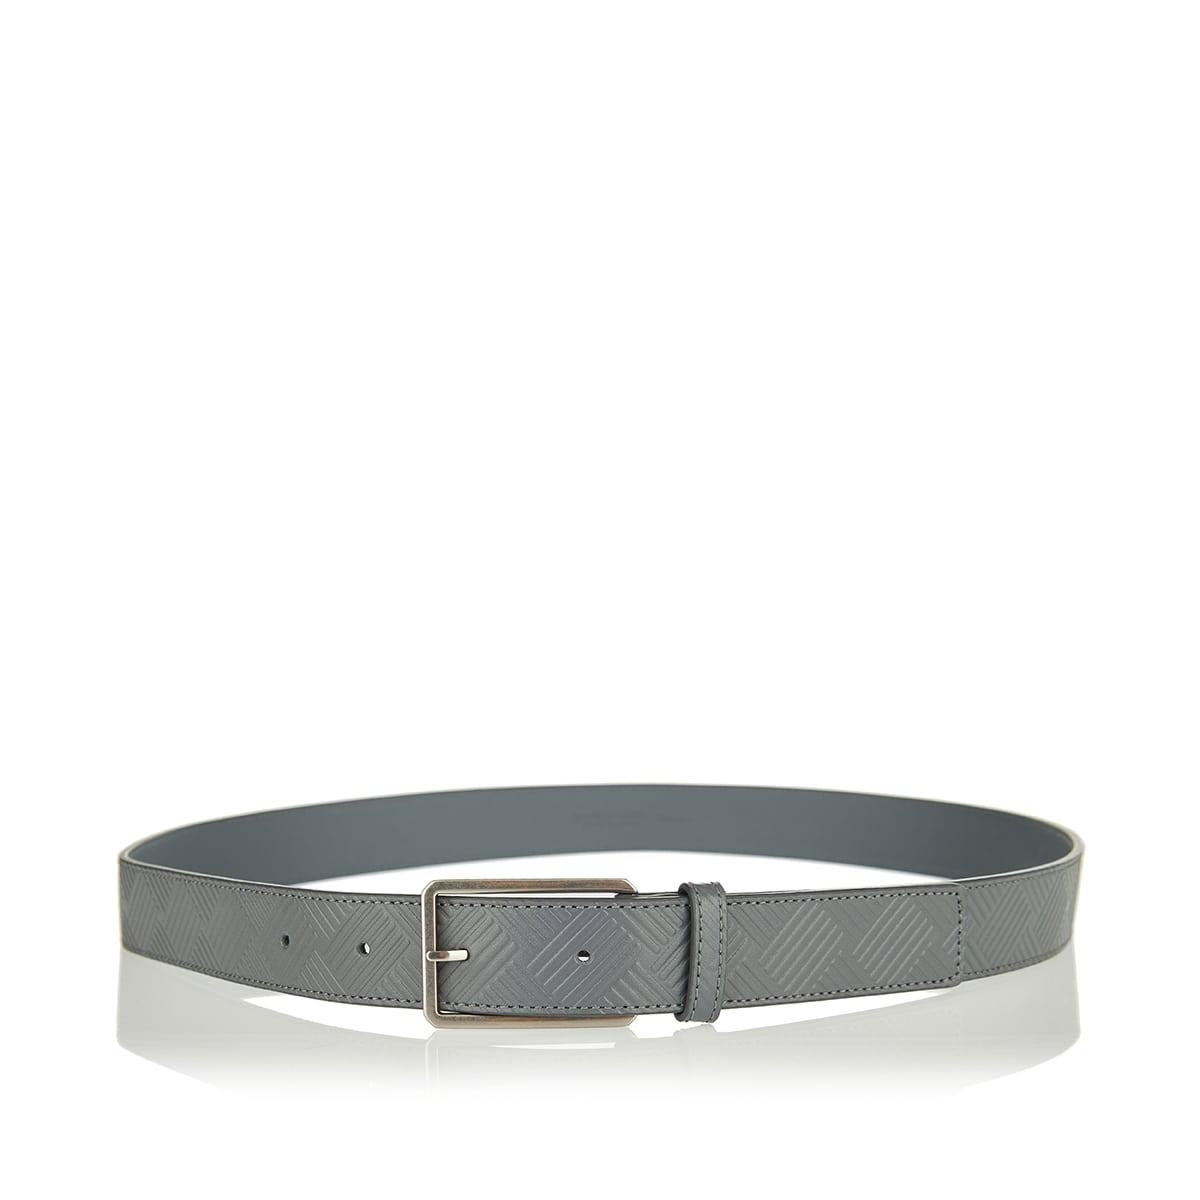 Embossed intreccio leather belt